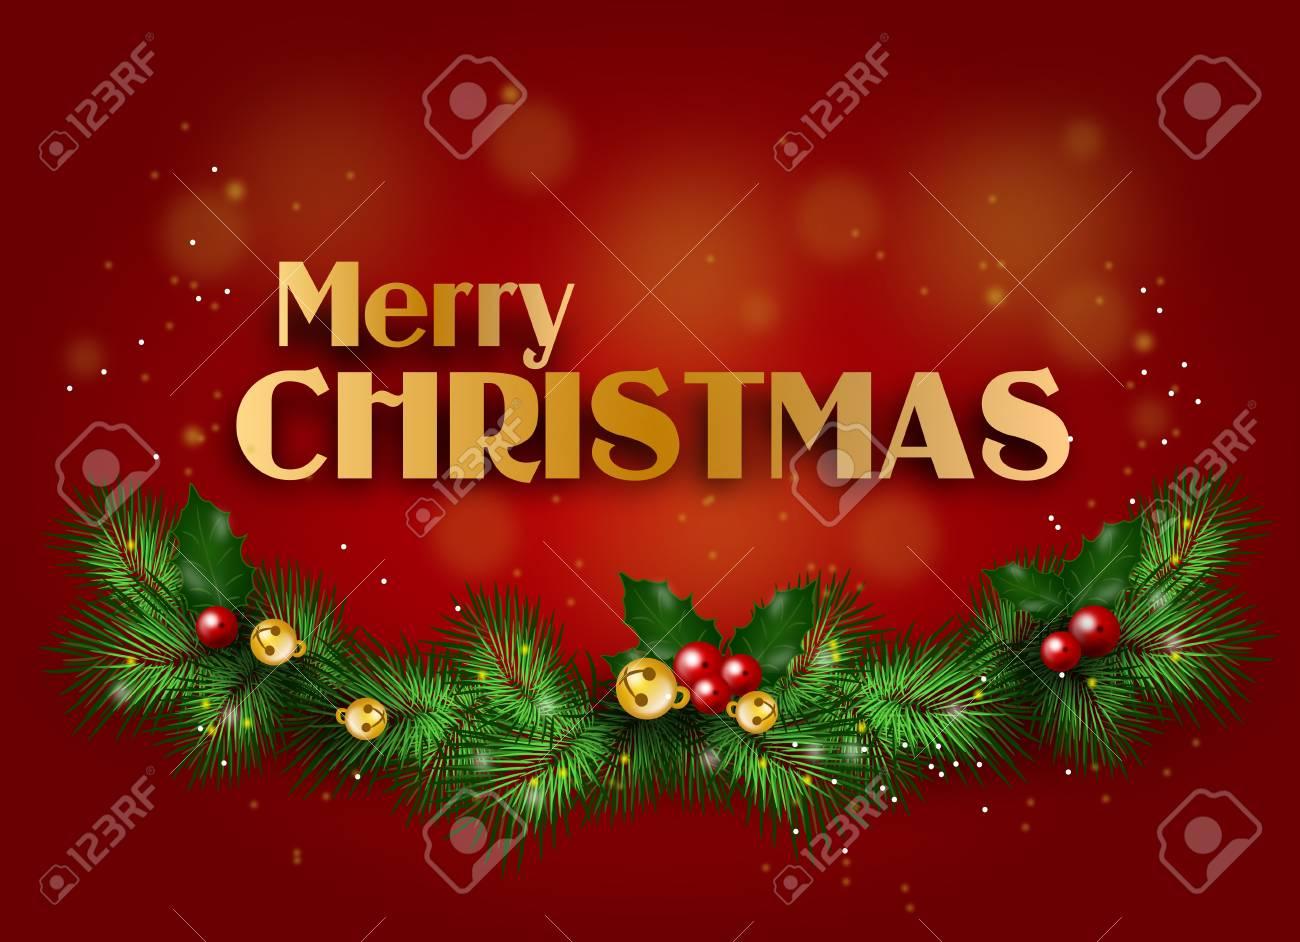 Merry Christmas Greetings.Stock Illustration